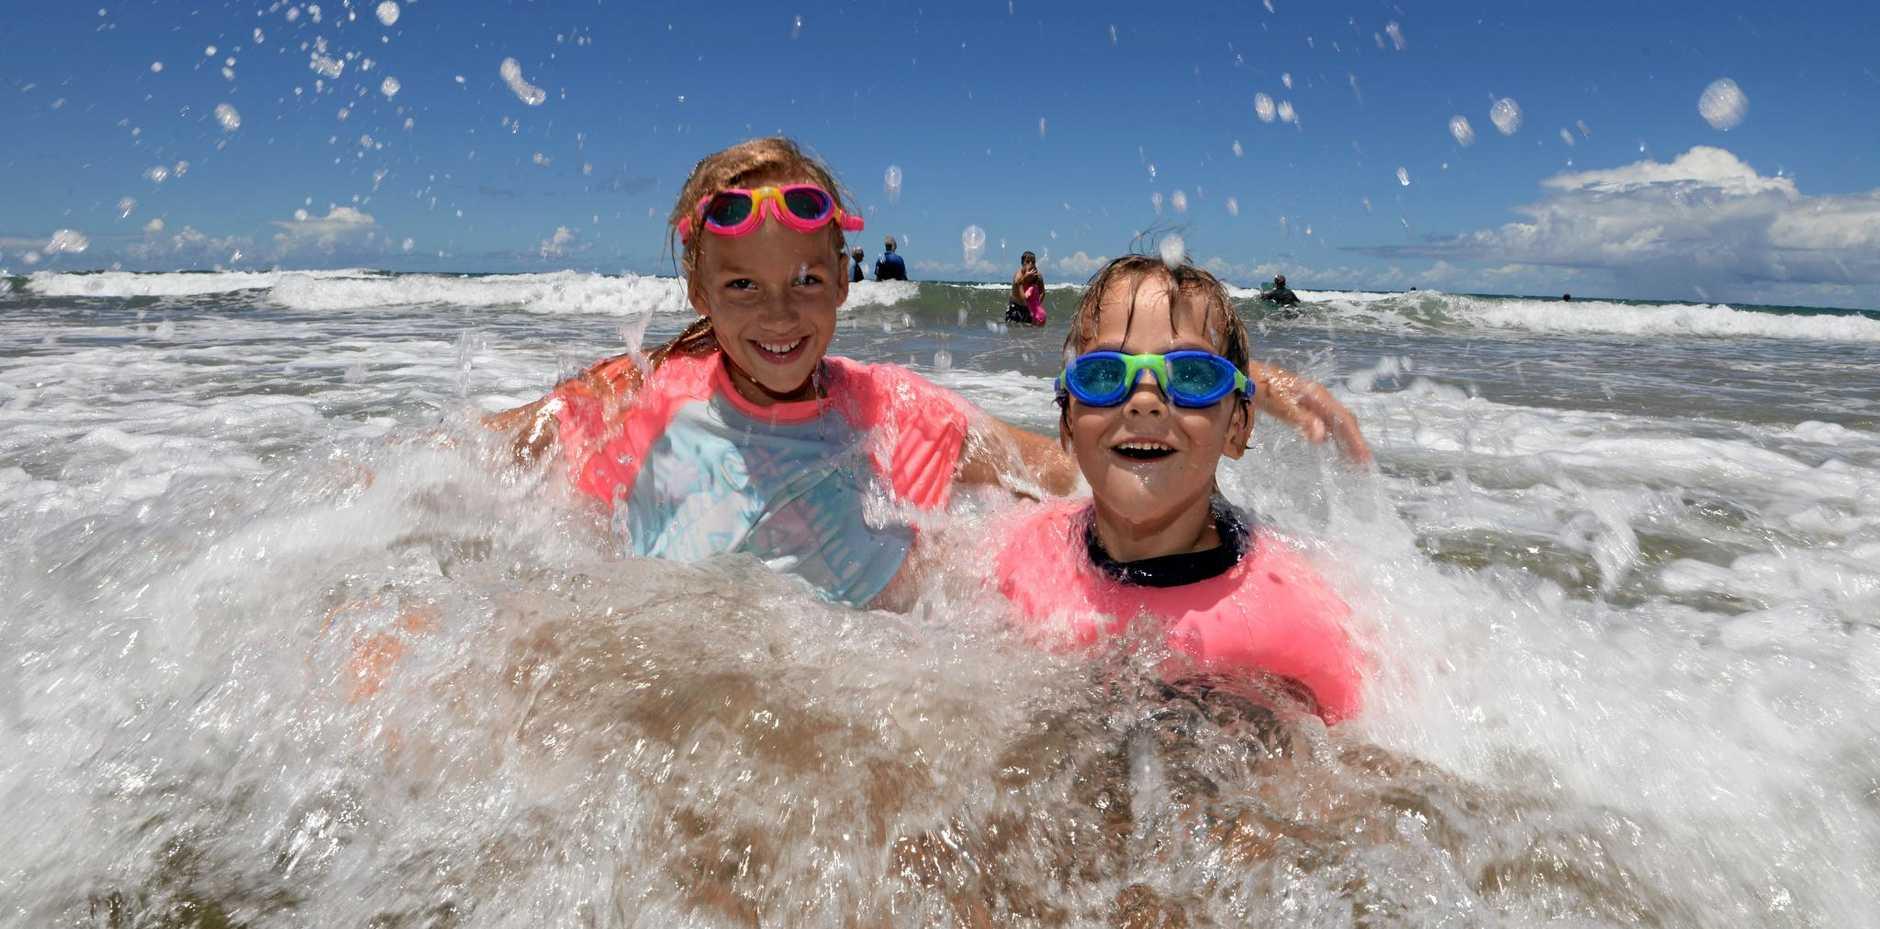 SUMMER WEATHER: Brisbane visitors Juliet and Harvey Taylor enjoying the surf on a hot day at Bargara.